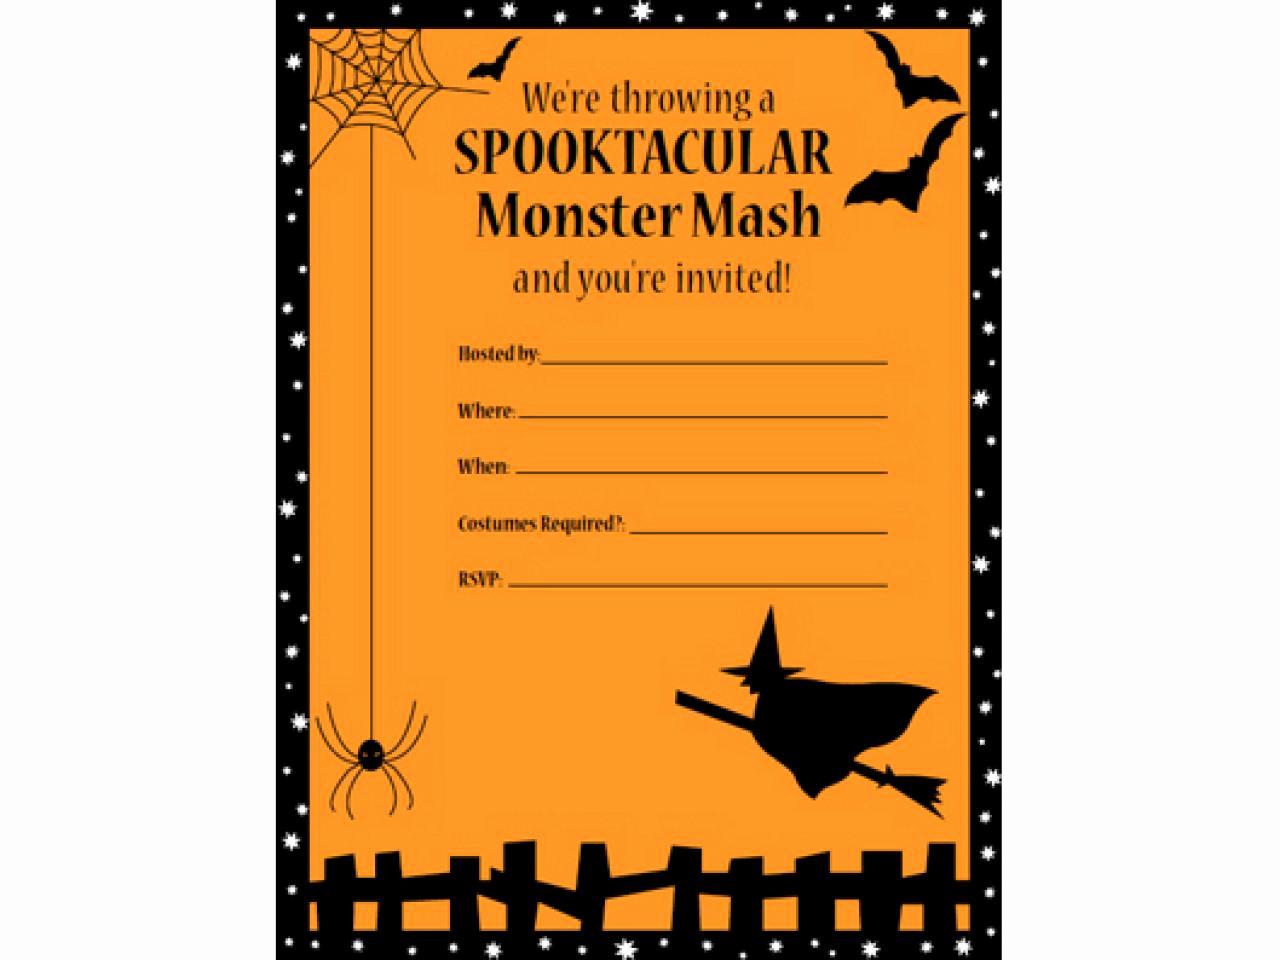 Free Halloween Party Invitation Templates Unique 41 Printable and Free Halloween Templates